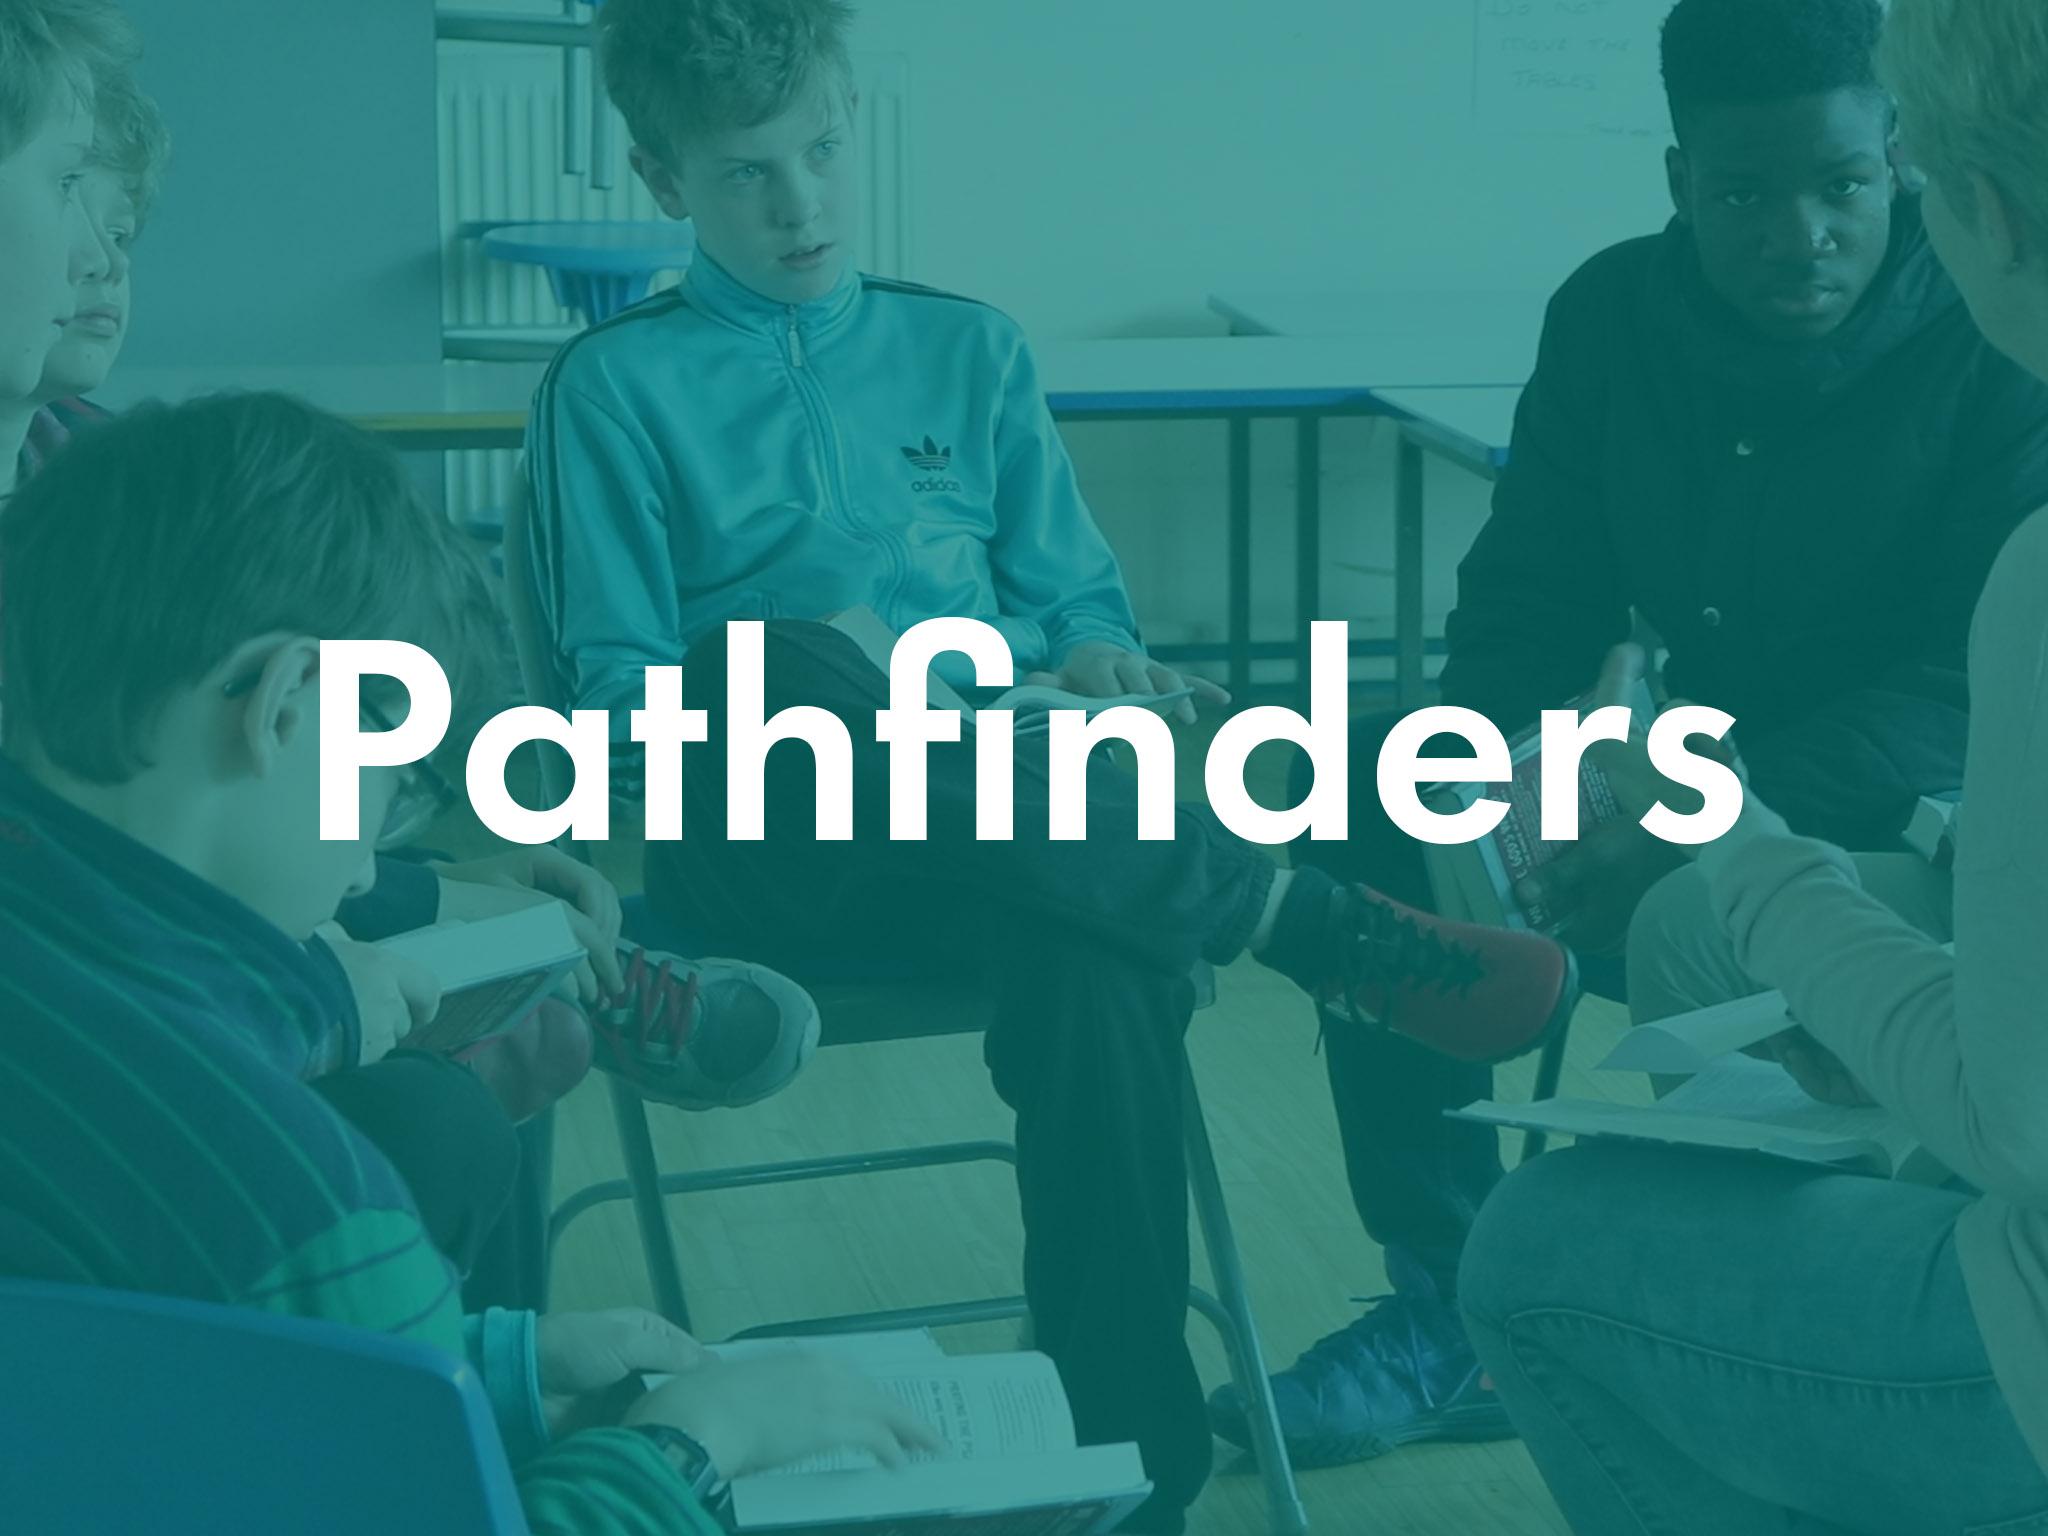 st-johns-harborne-youth-pathfinders2-web.jpg